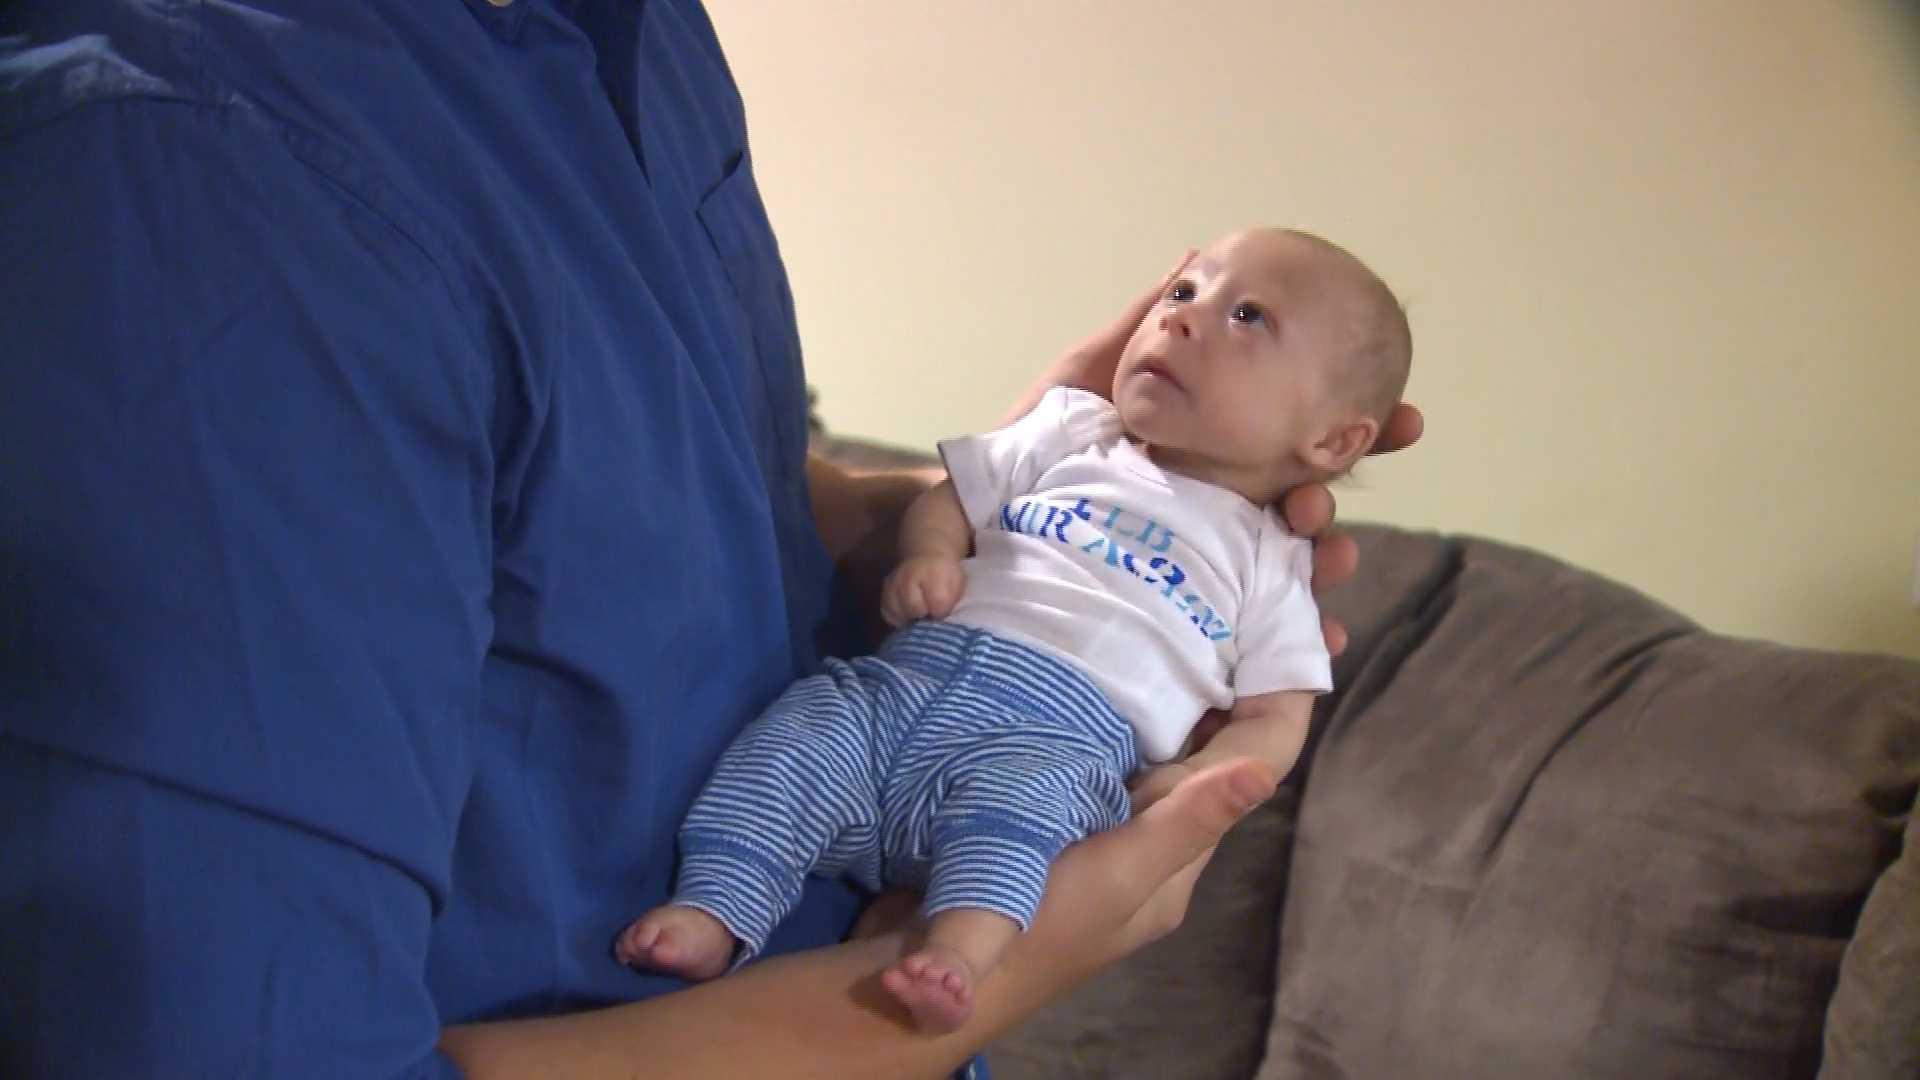 bhdn matthew riddle tiny baby condition pkg wlky st1 d367 136 1 mp4 still001